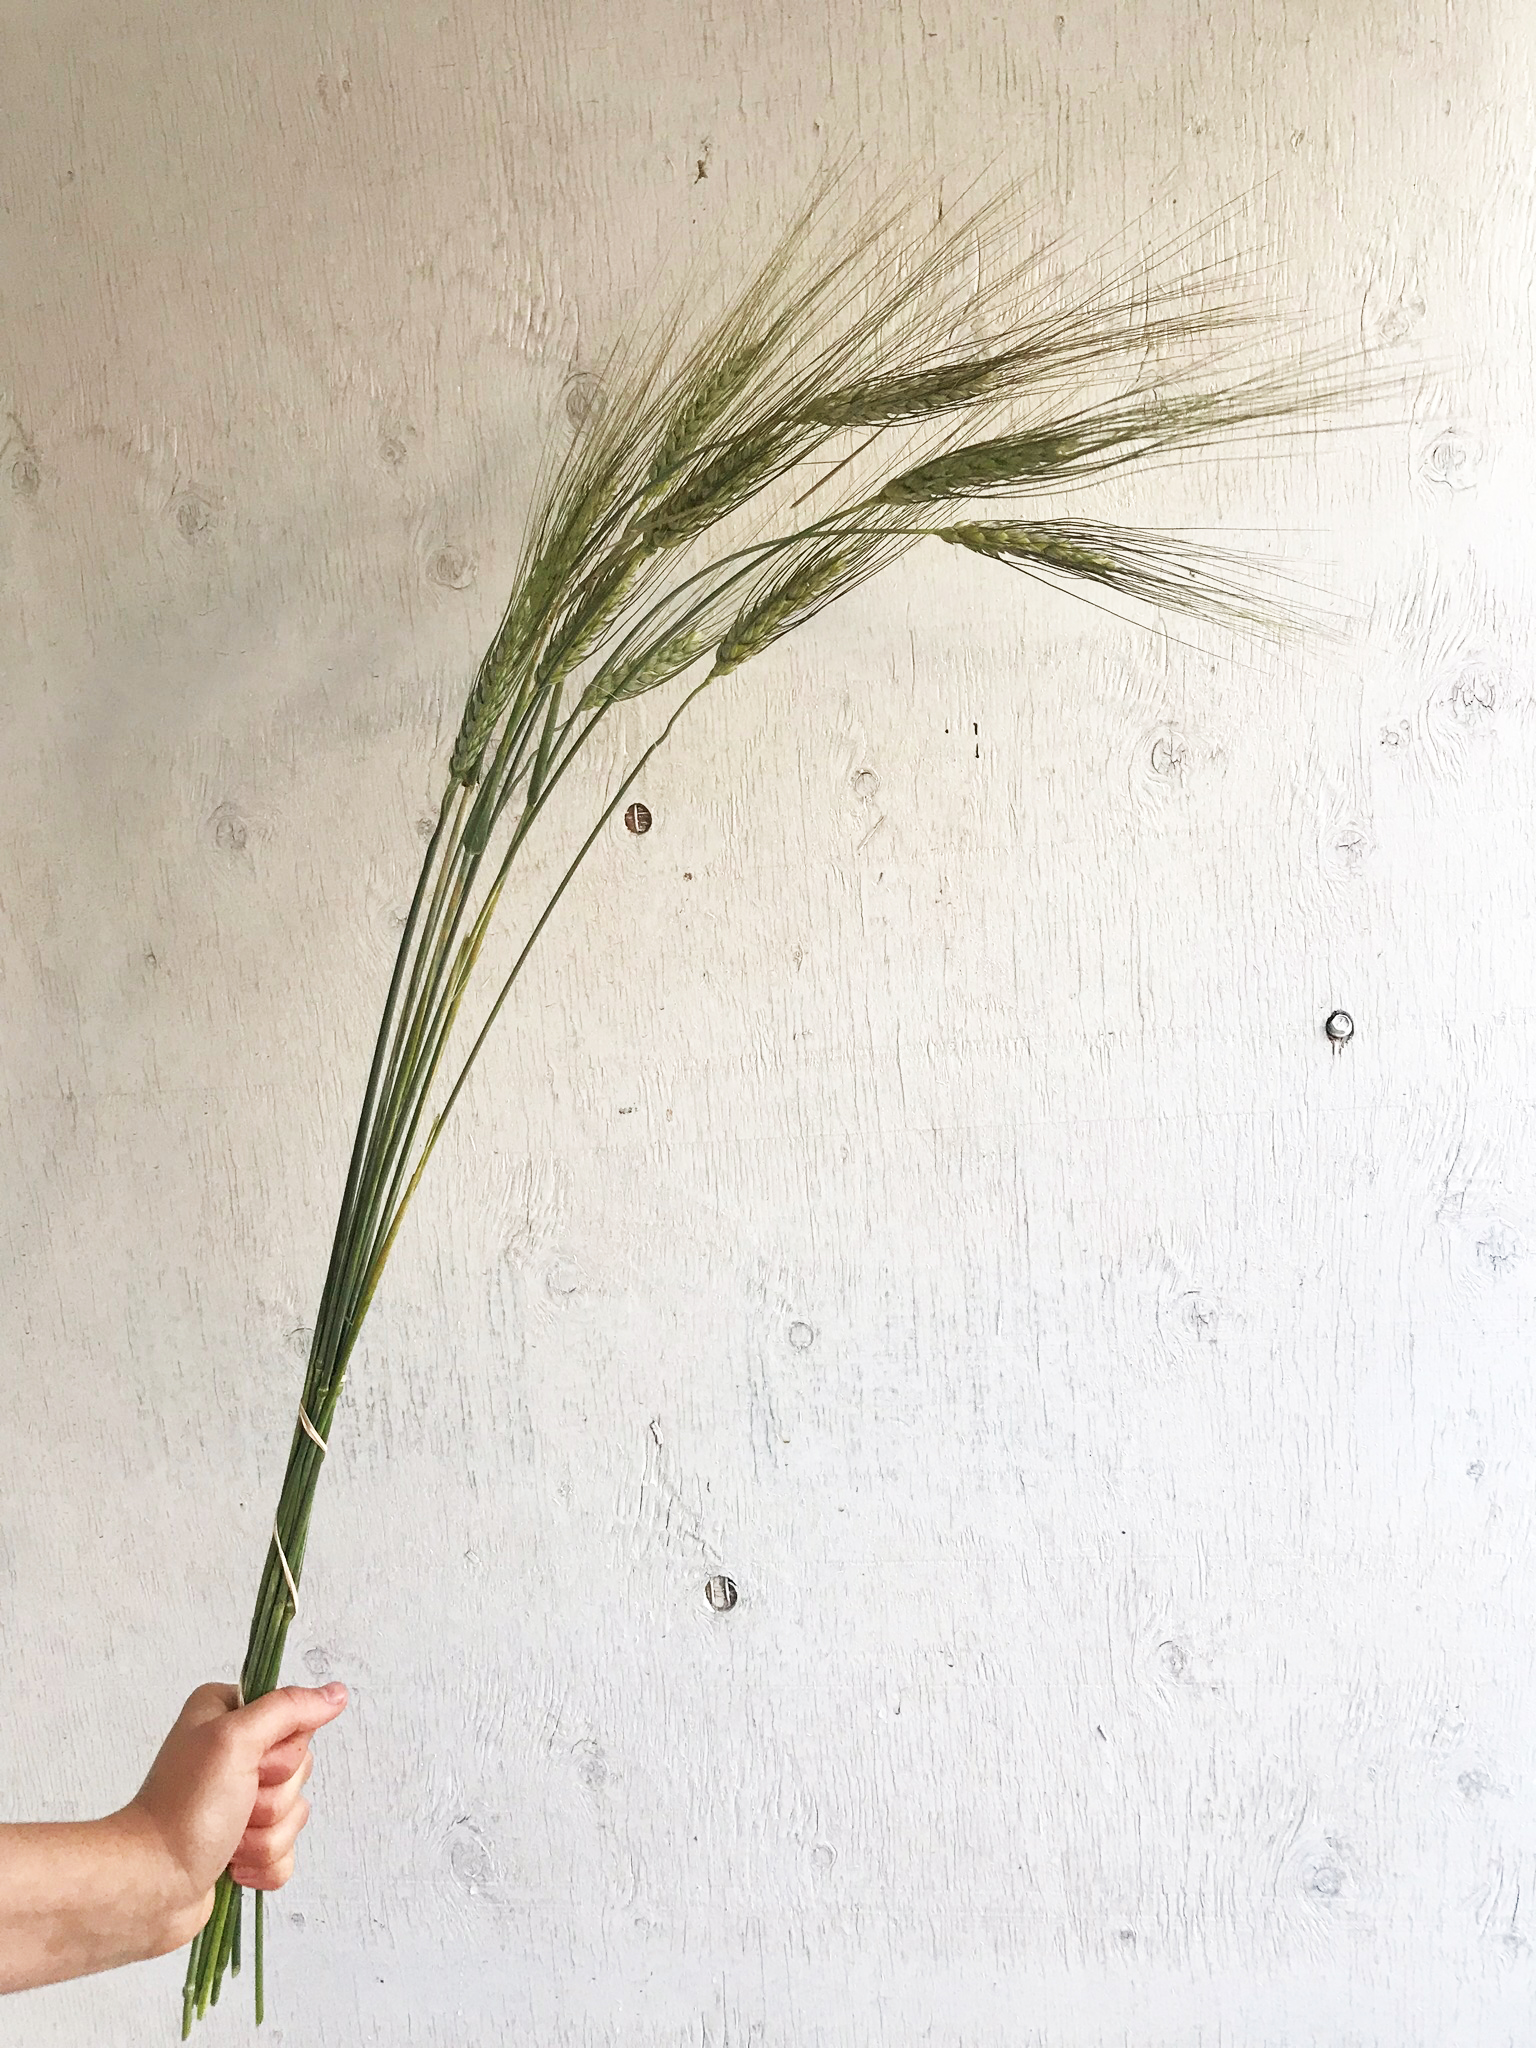 Wheat - Black Tip